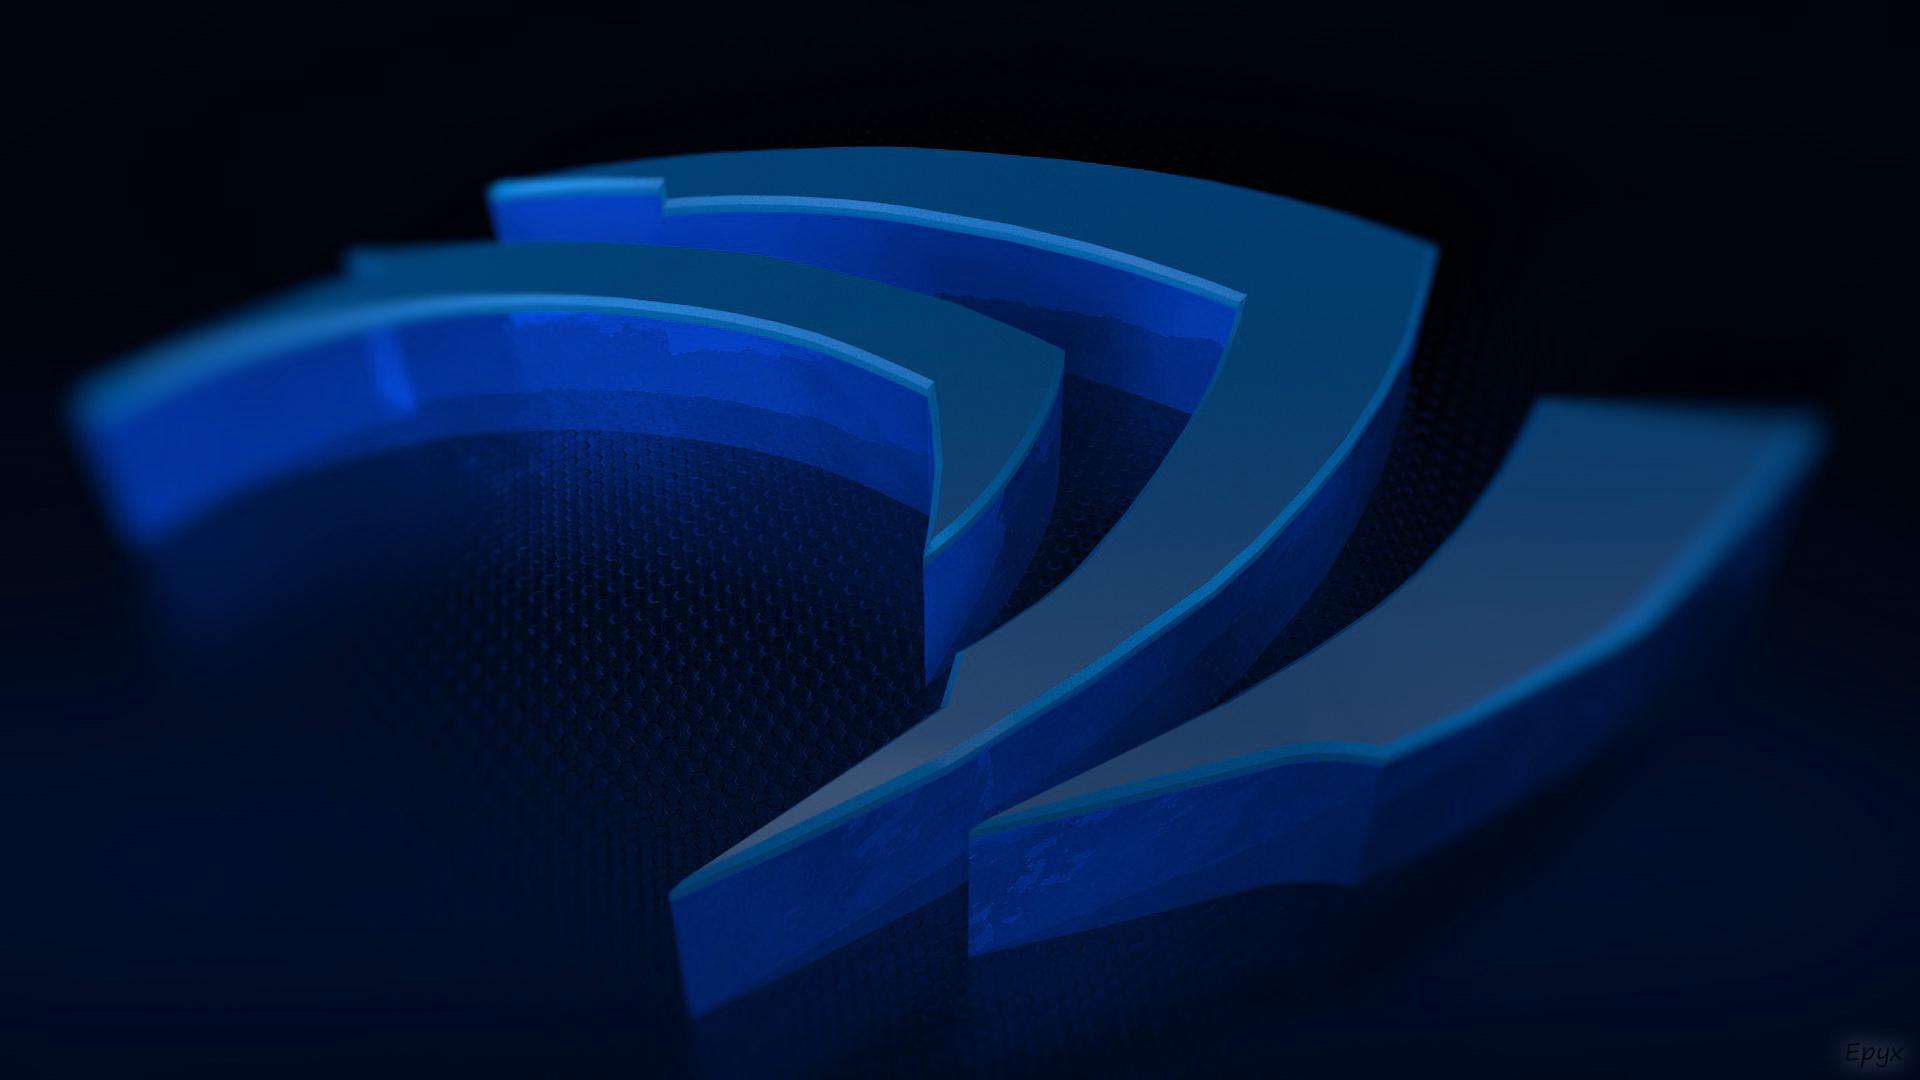 Nvidia wallpaper 2 by trsepyx on deviantart - 1920x1080 wallpaper nvidia ...